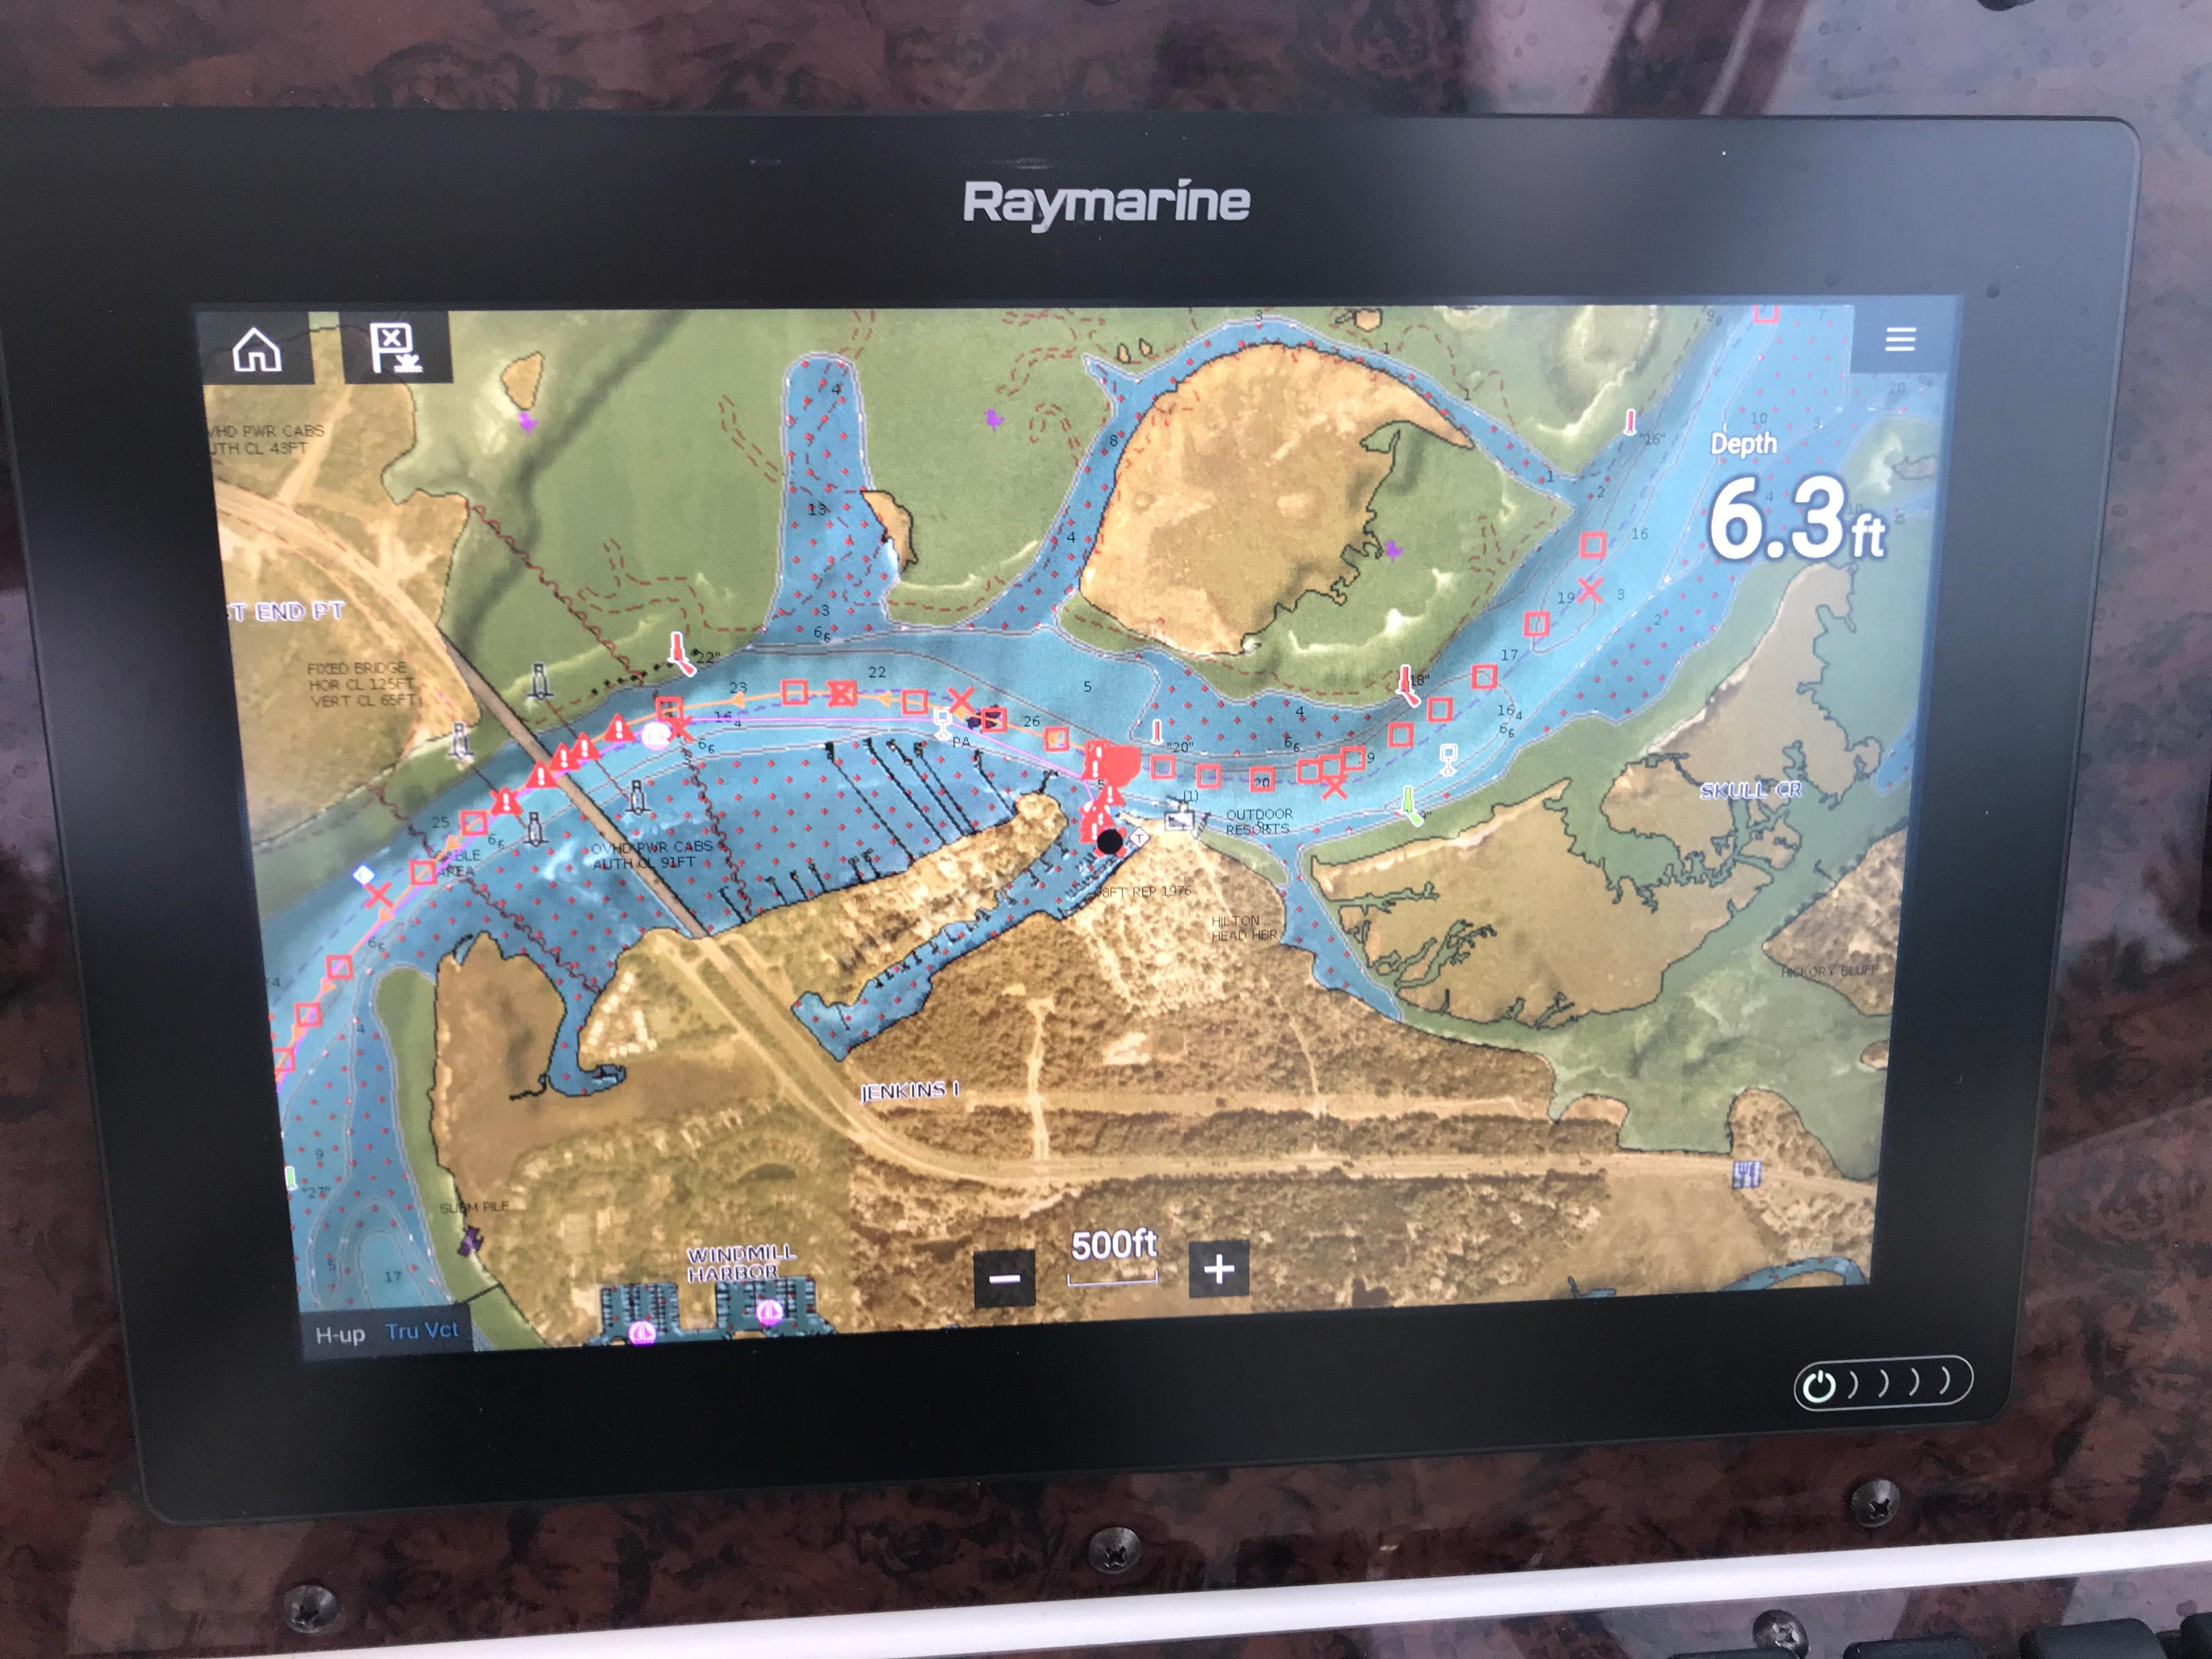 Sea Ray 370 Express Cruiser - Raymarine Axiom Touch Screen Display